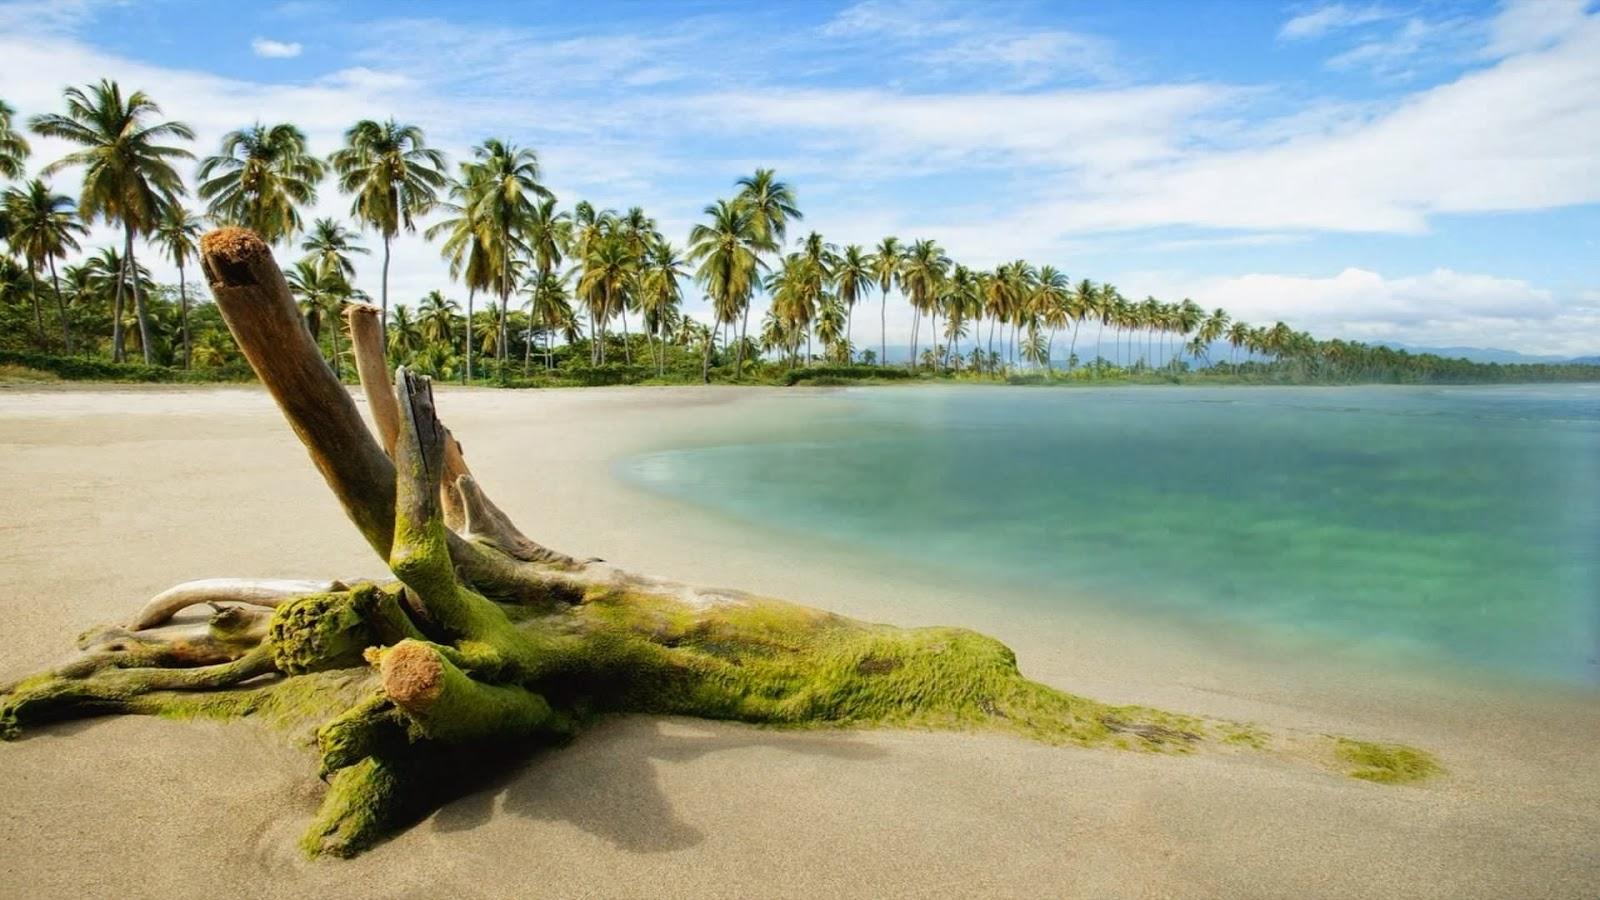 Beach Nature HD Wallpapers 1080p Widescreen - HD Wallpapers Blog